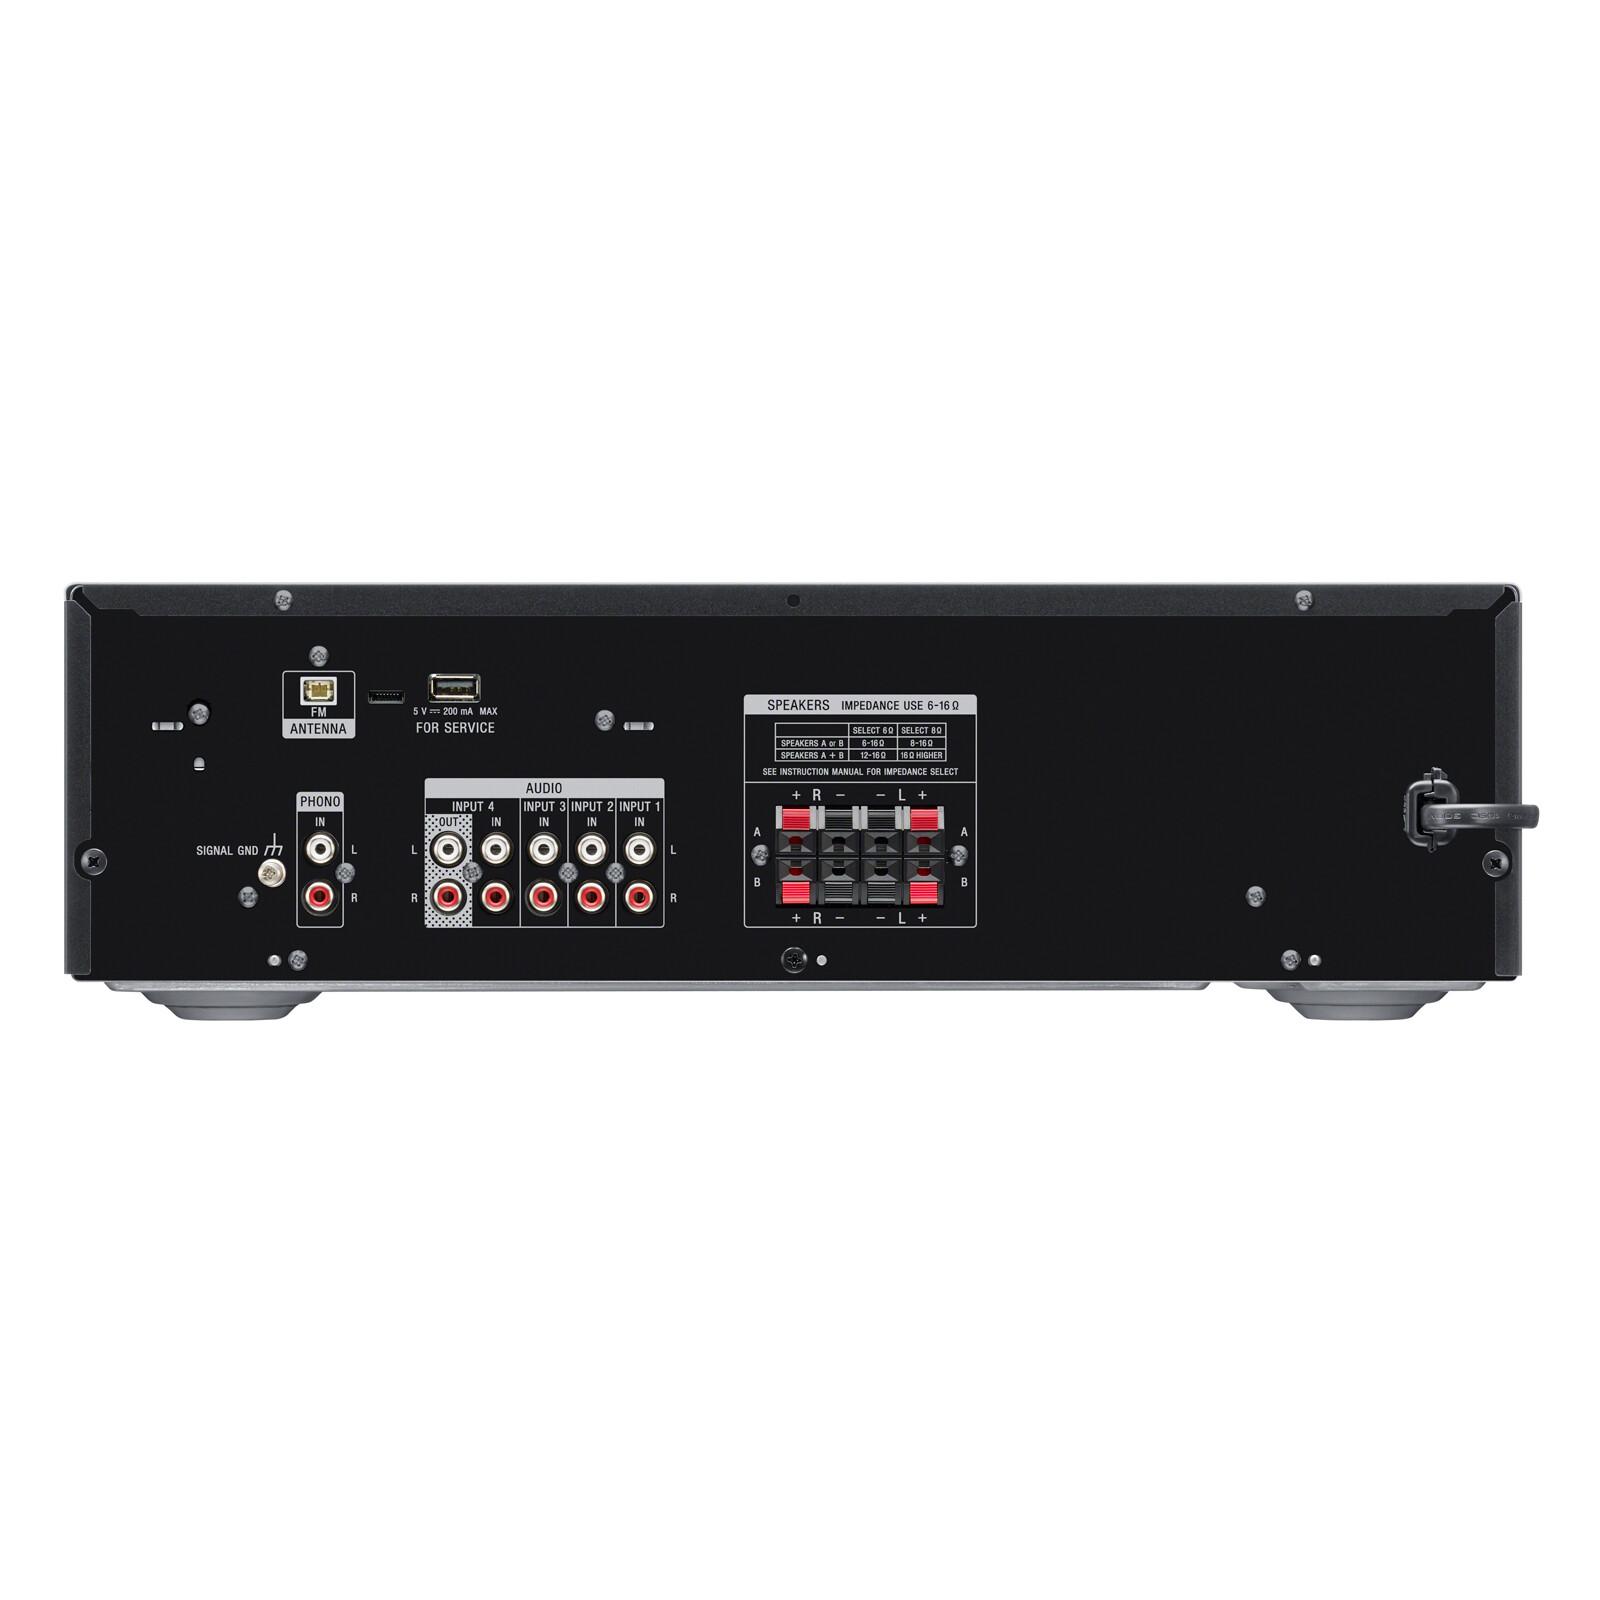 Sony STR-DH190 Receiver